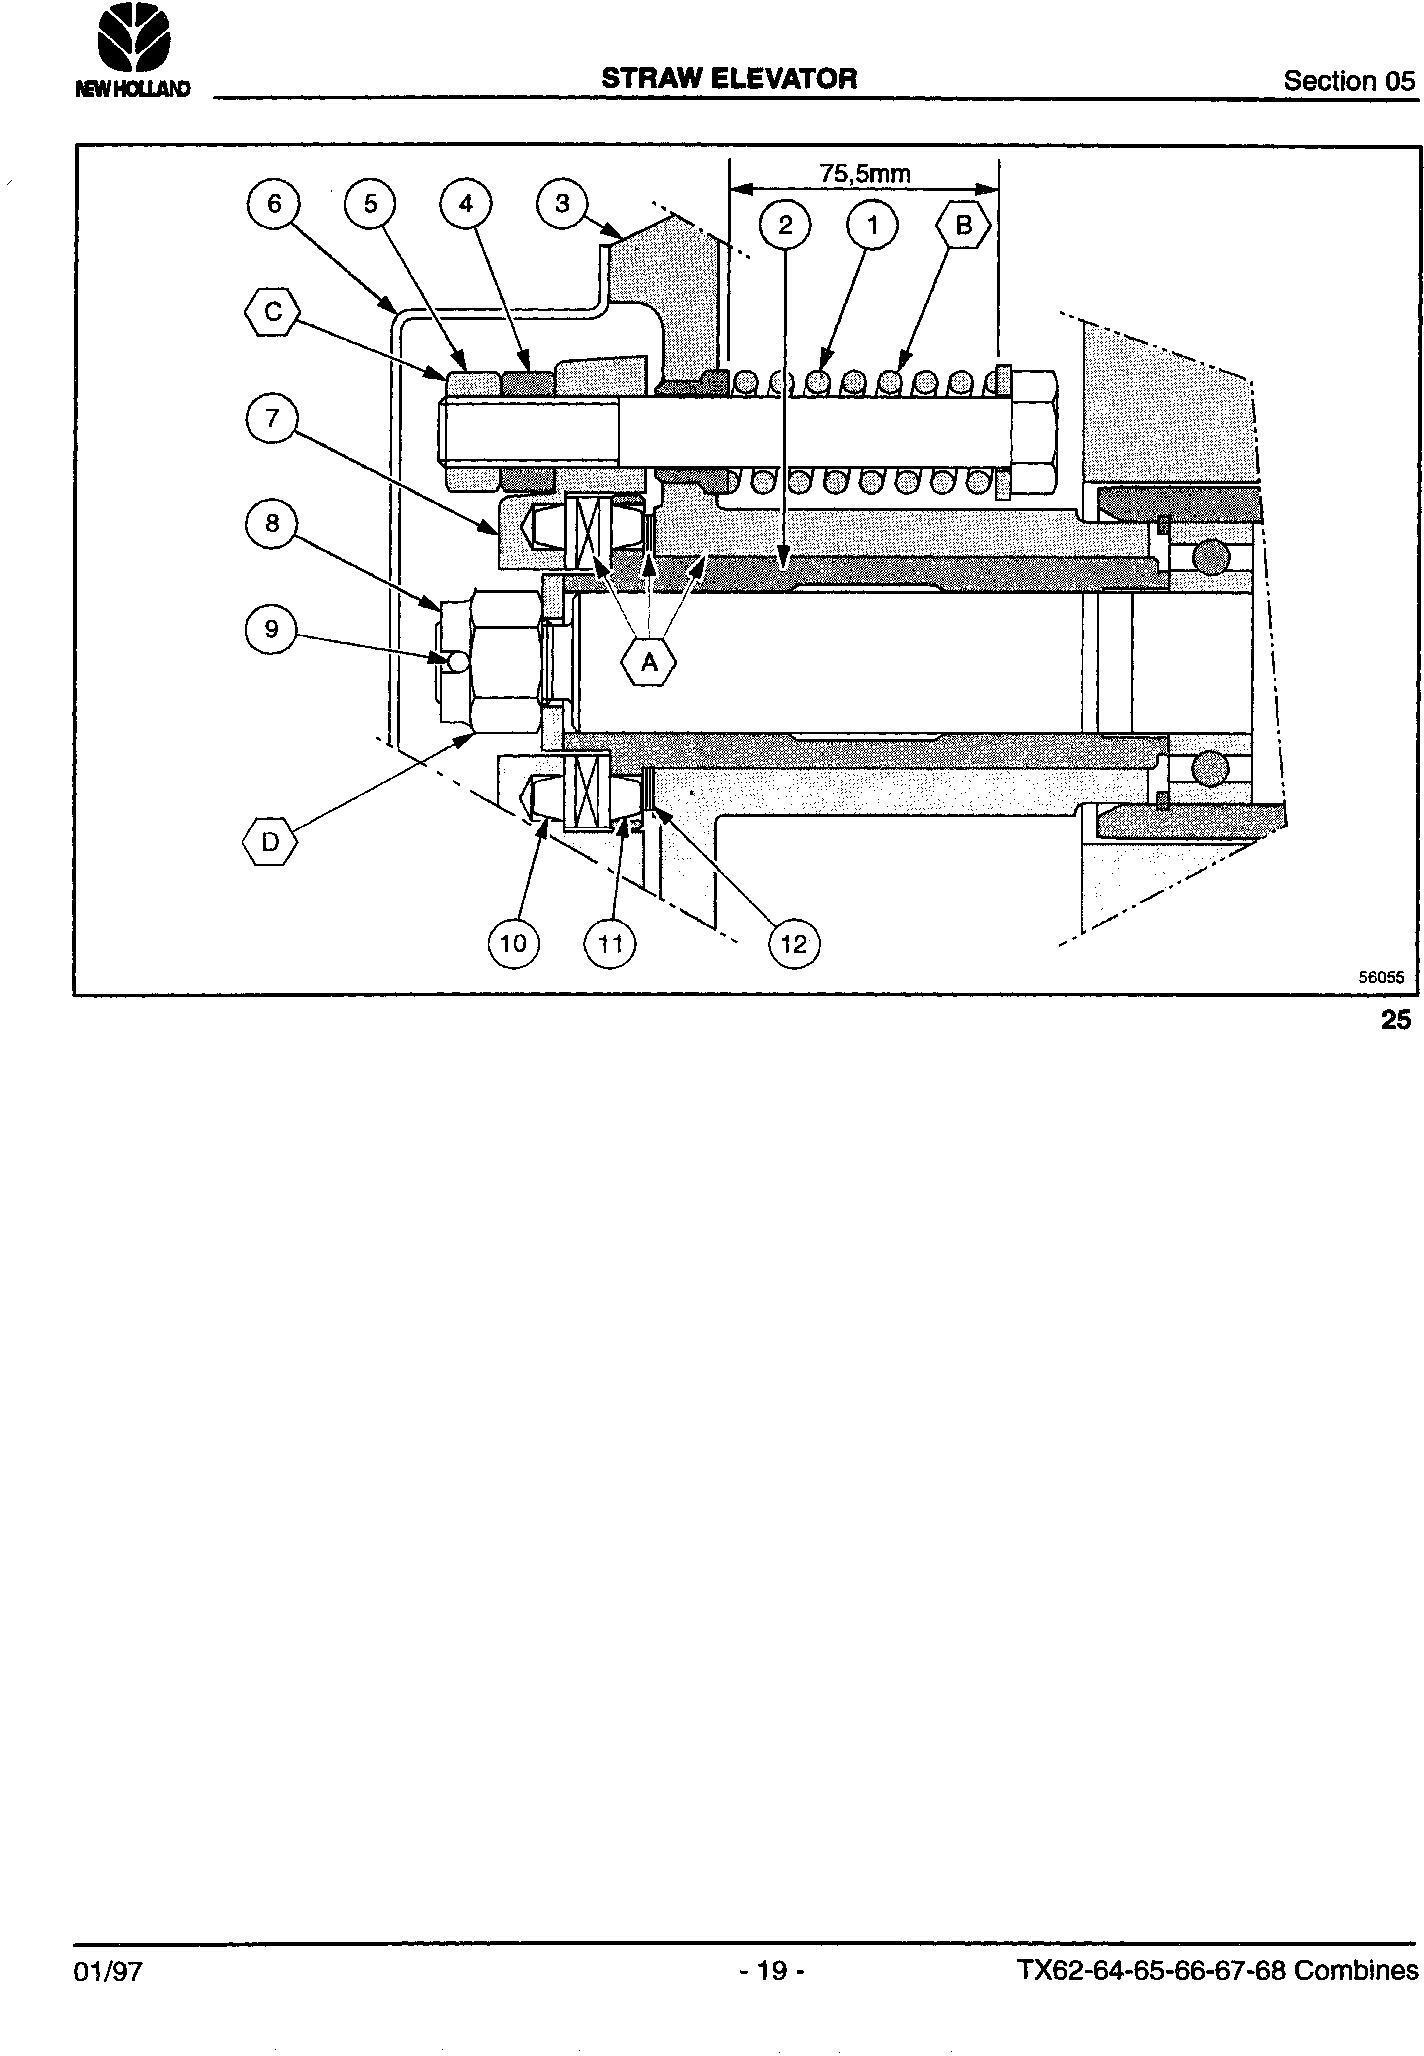 New Holland TX66, TX68 Combine Service Manual - 3